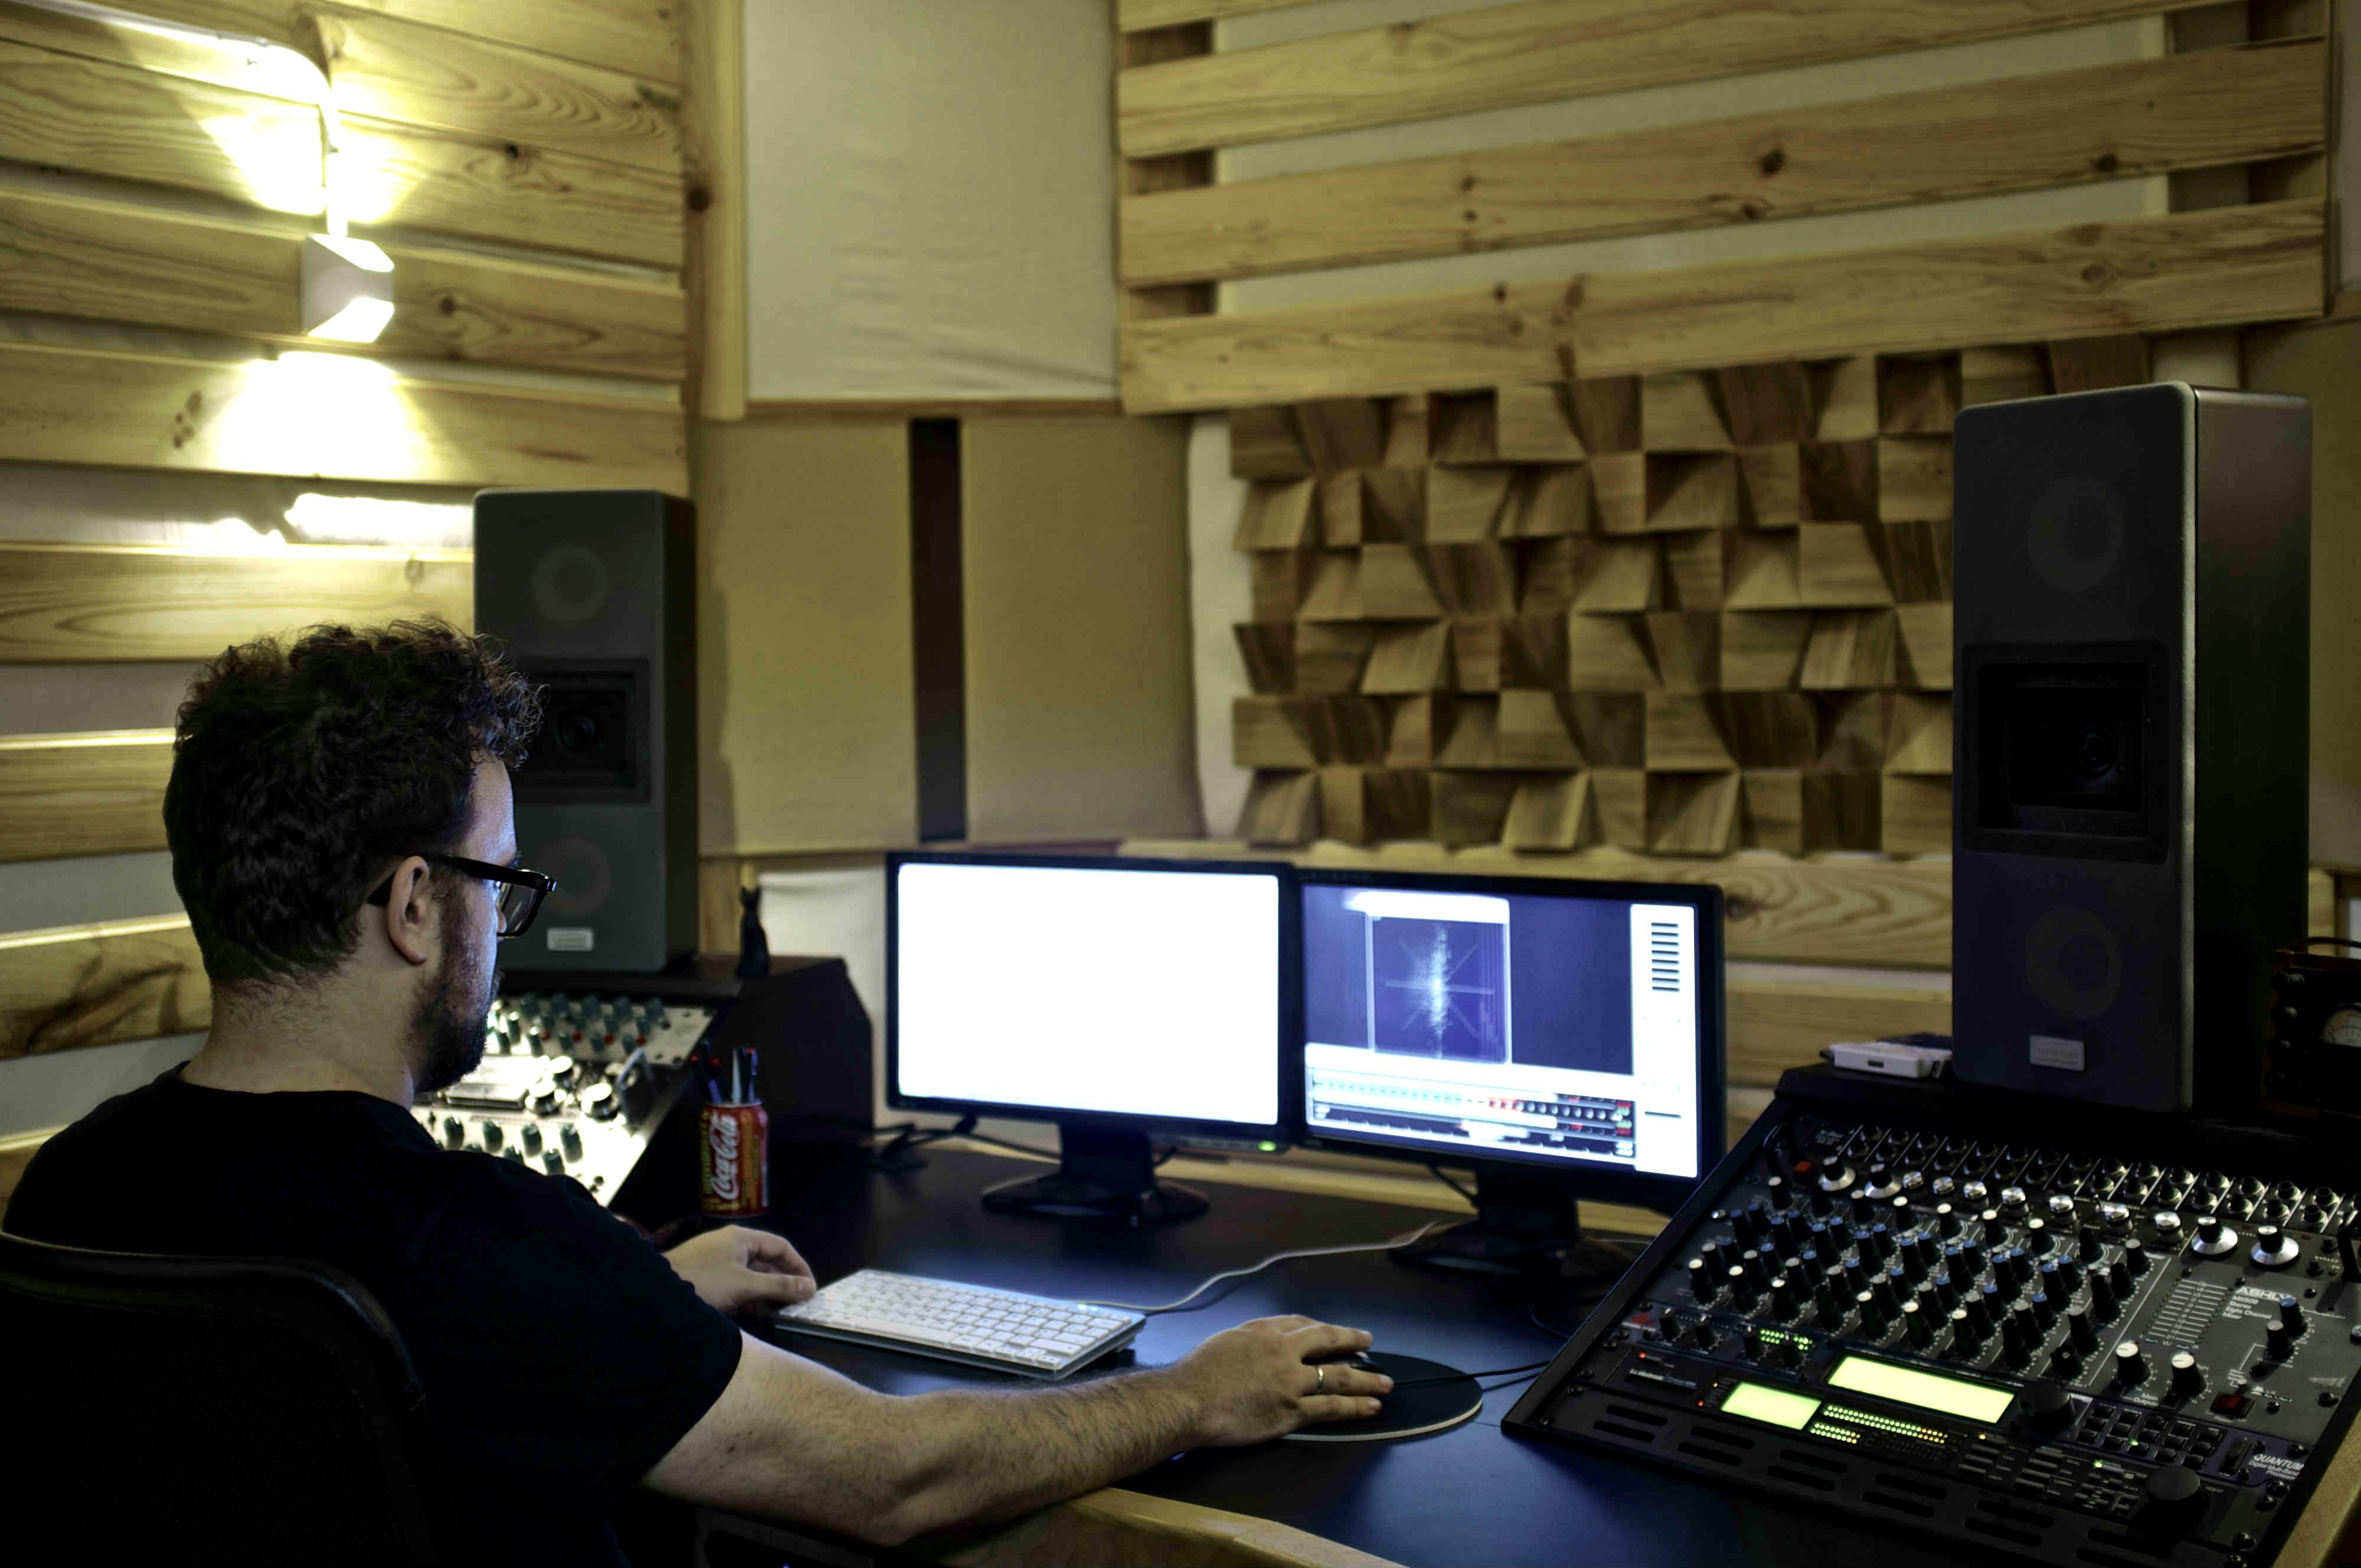 en Vacuum artinCom entrevista Javier Roldon